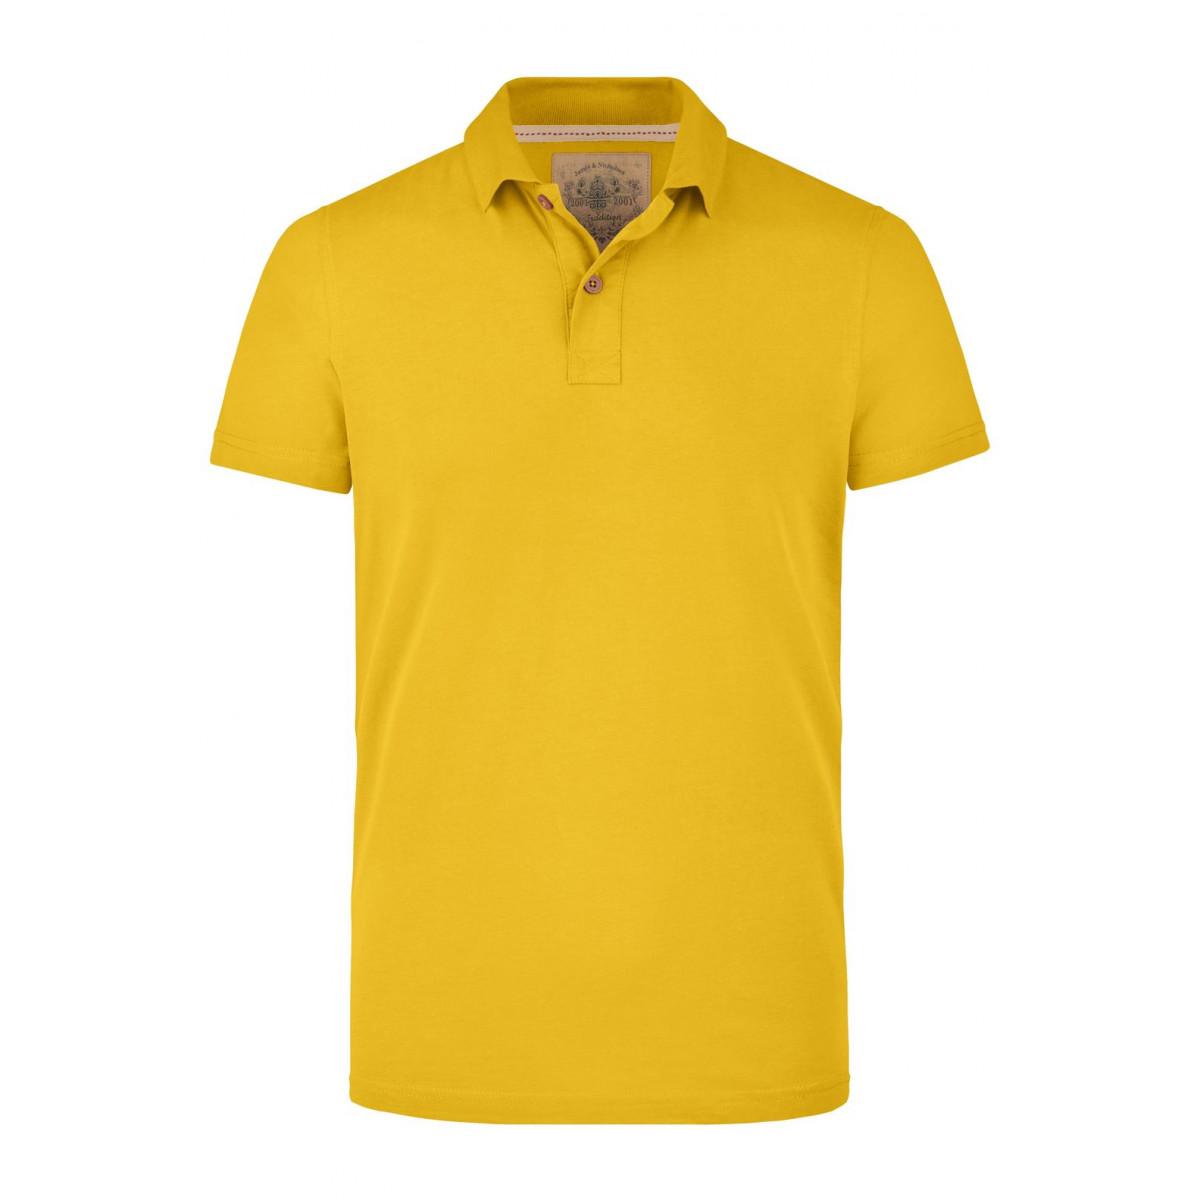 Рубашка поло мужская JN941 Mens Vintage Polo - Ярко-желтый